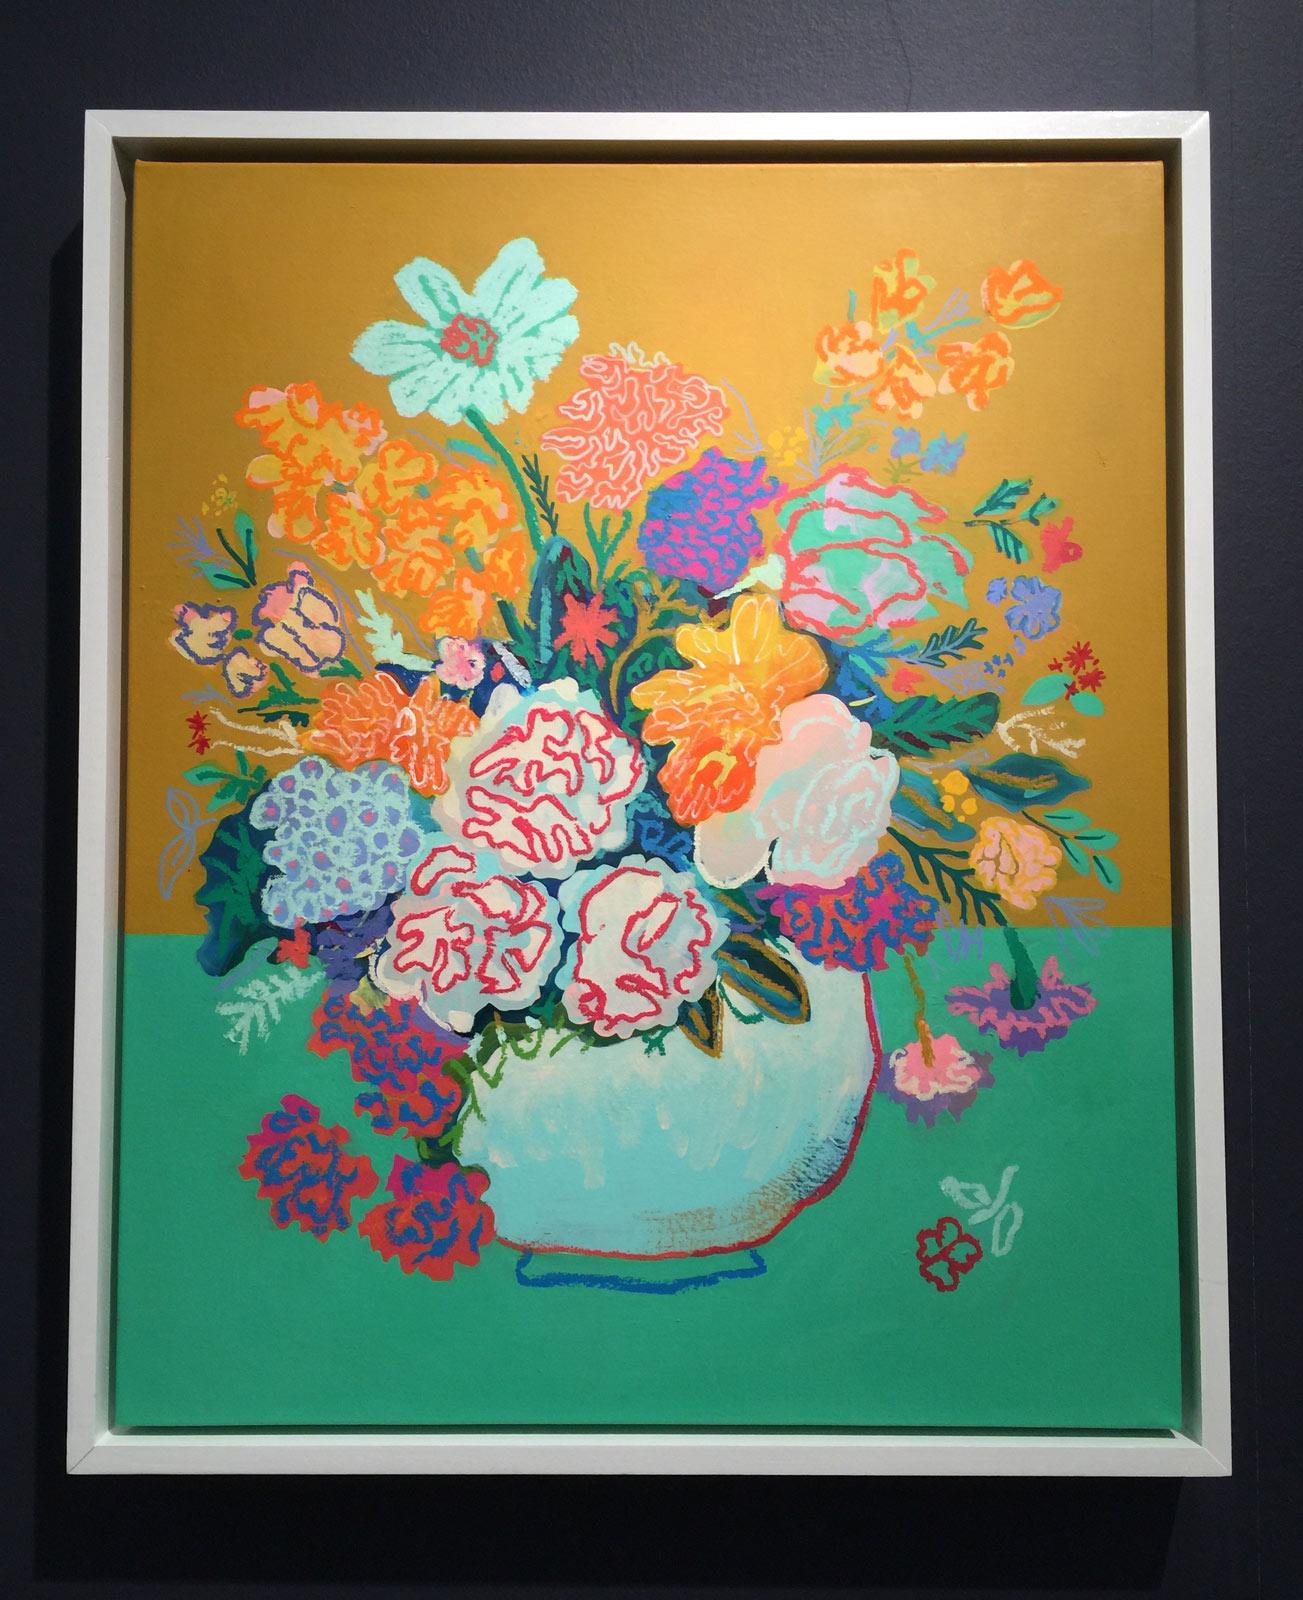 John-Holcomb-painting-Rebecca-Hossack-Gallery.jpg